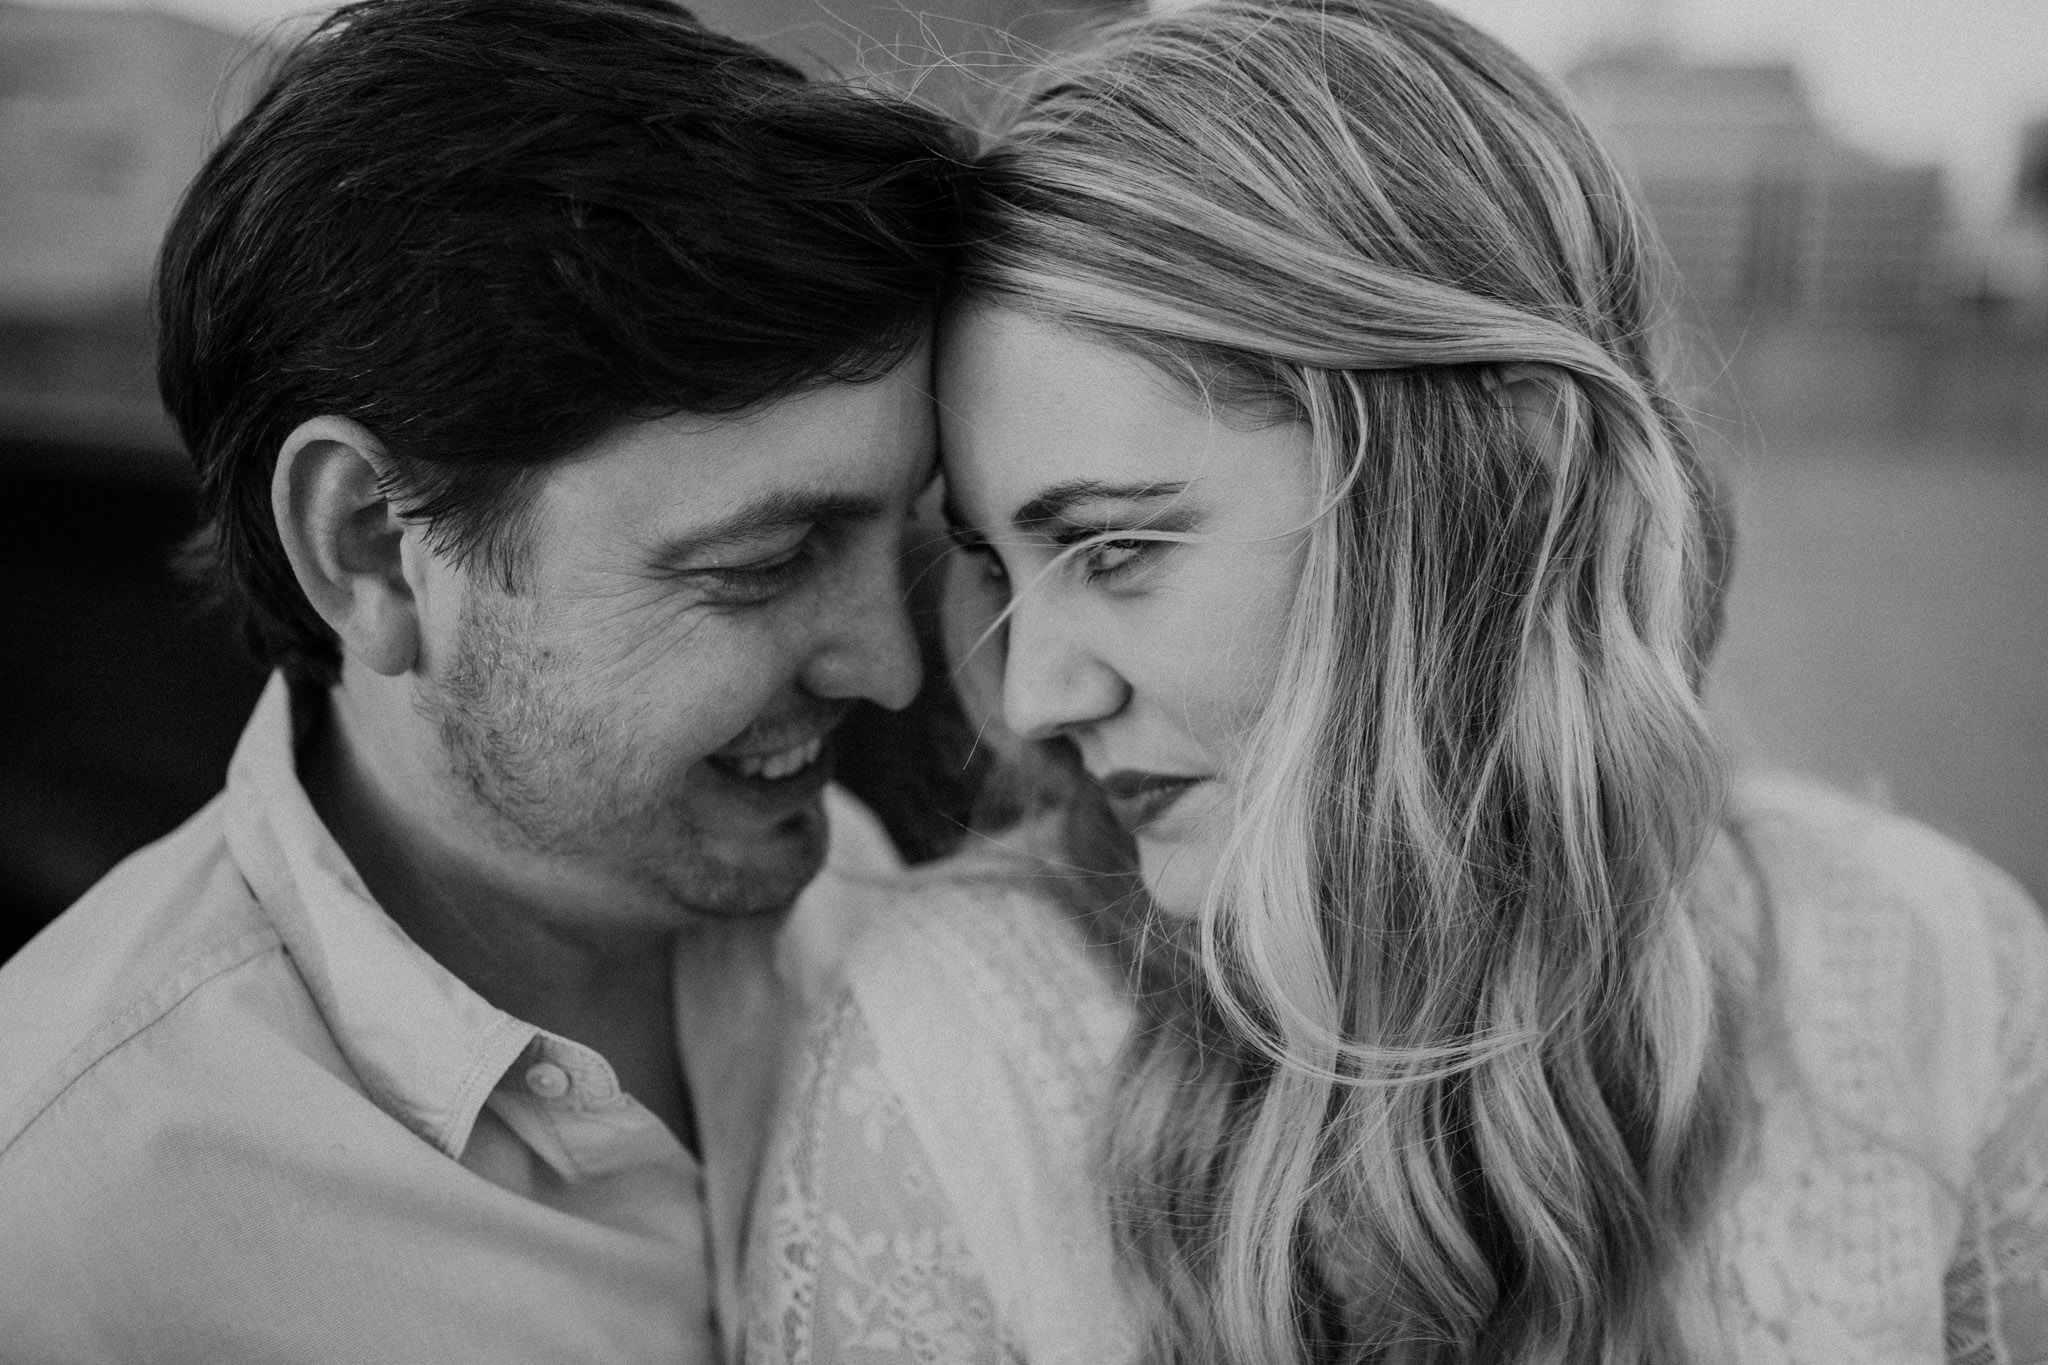 Angelle&Charlie_DFW_Wedding_Photography_21.jpg